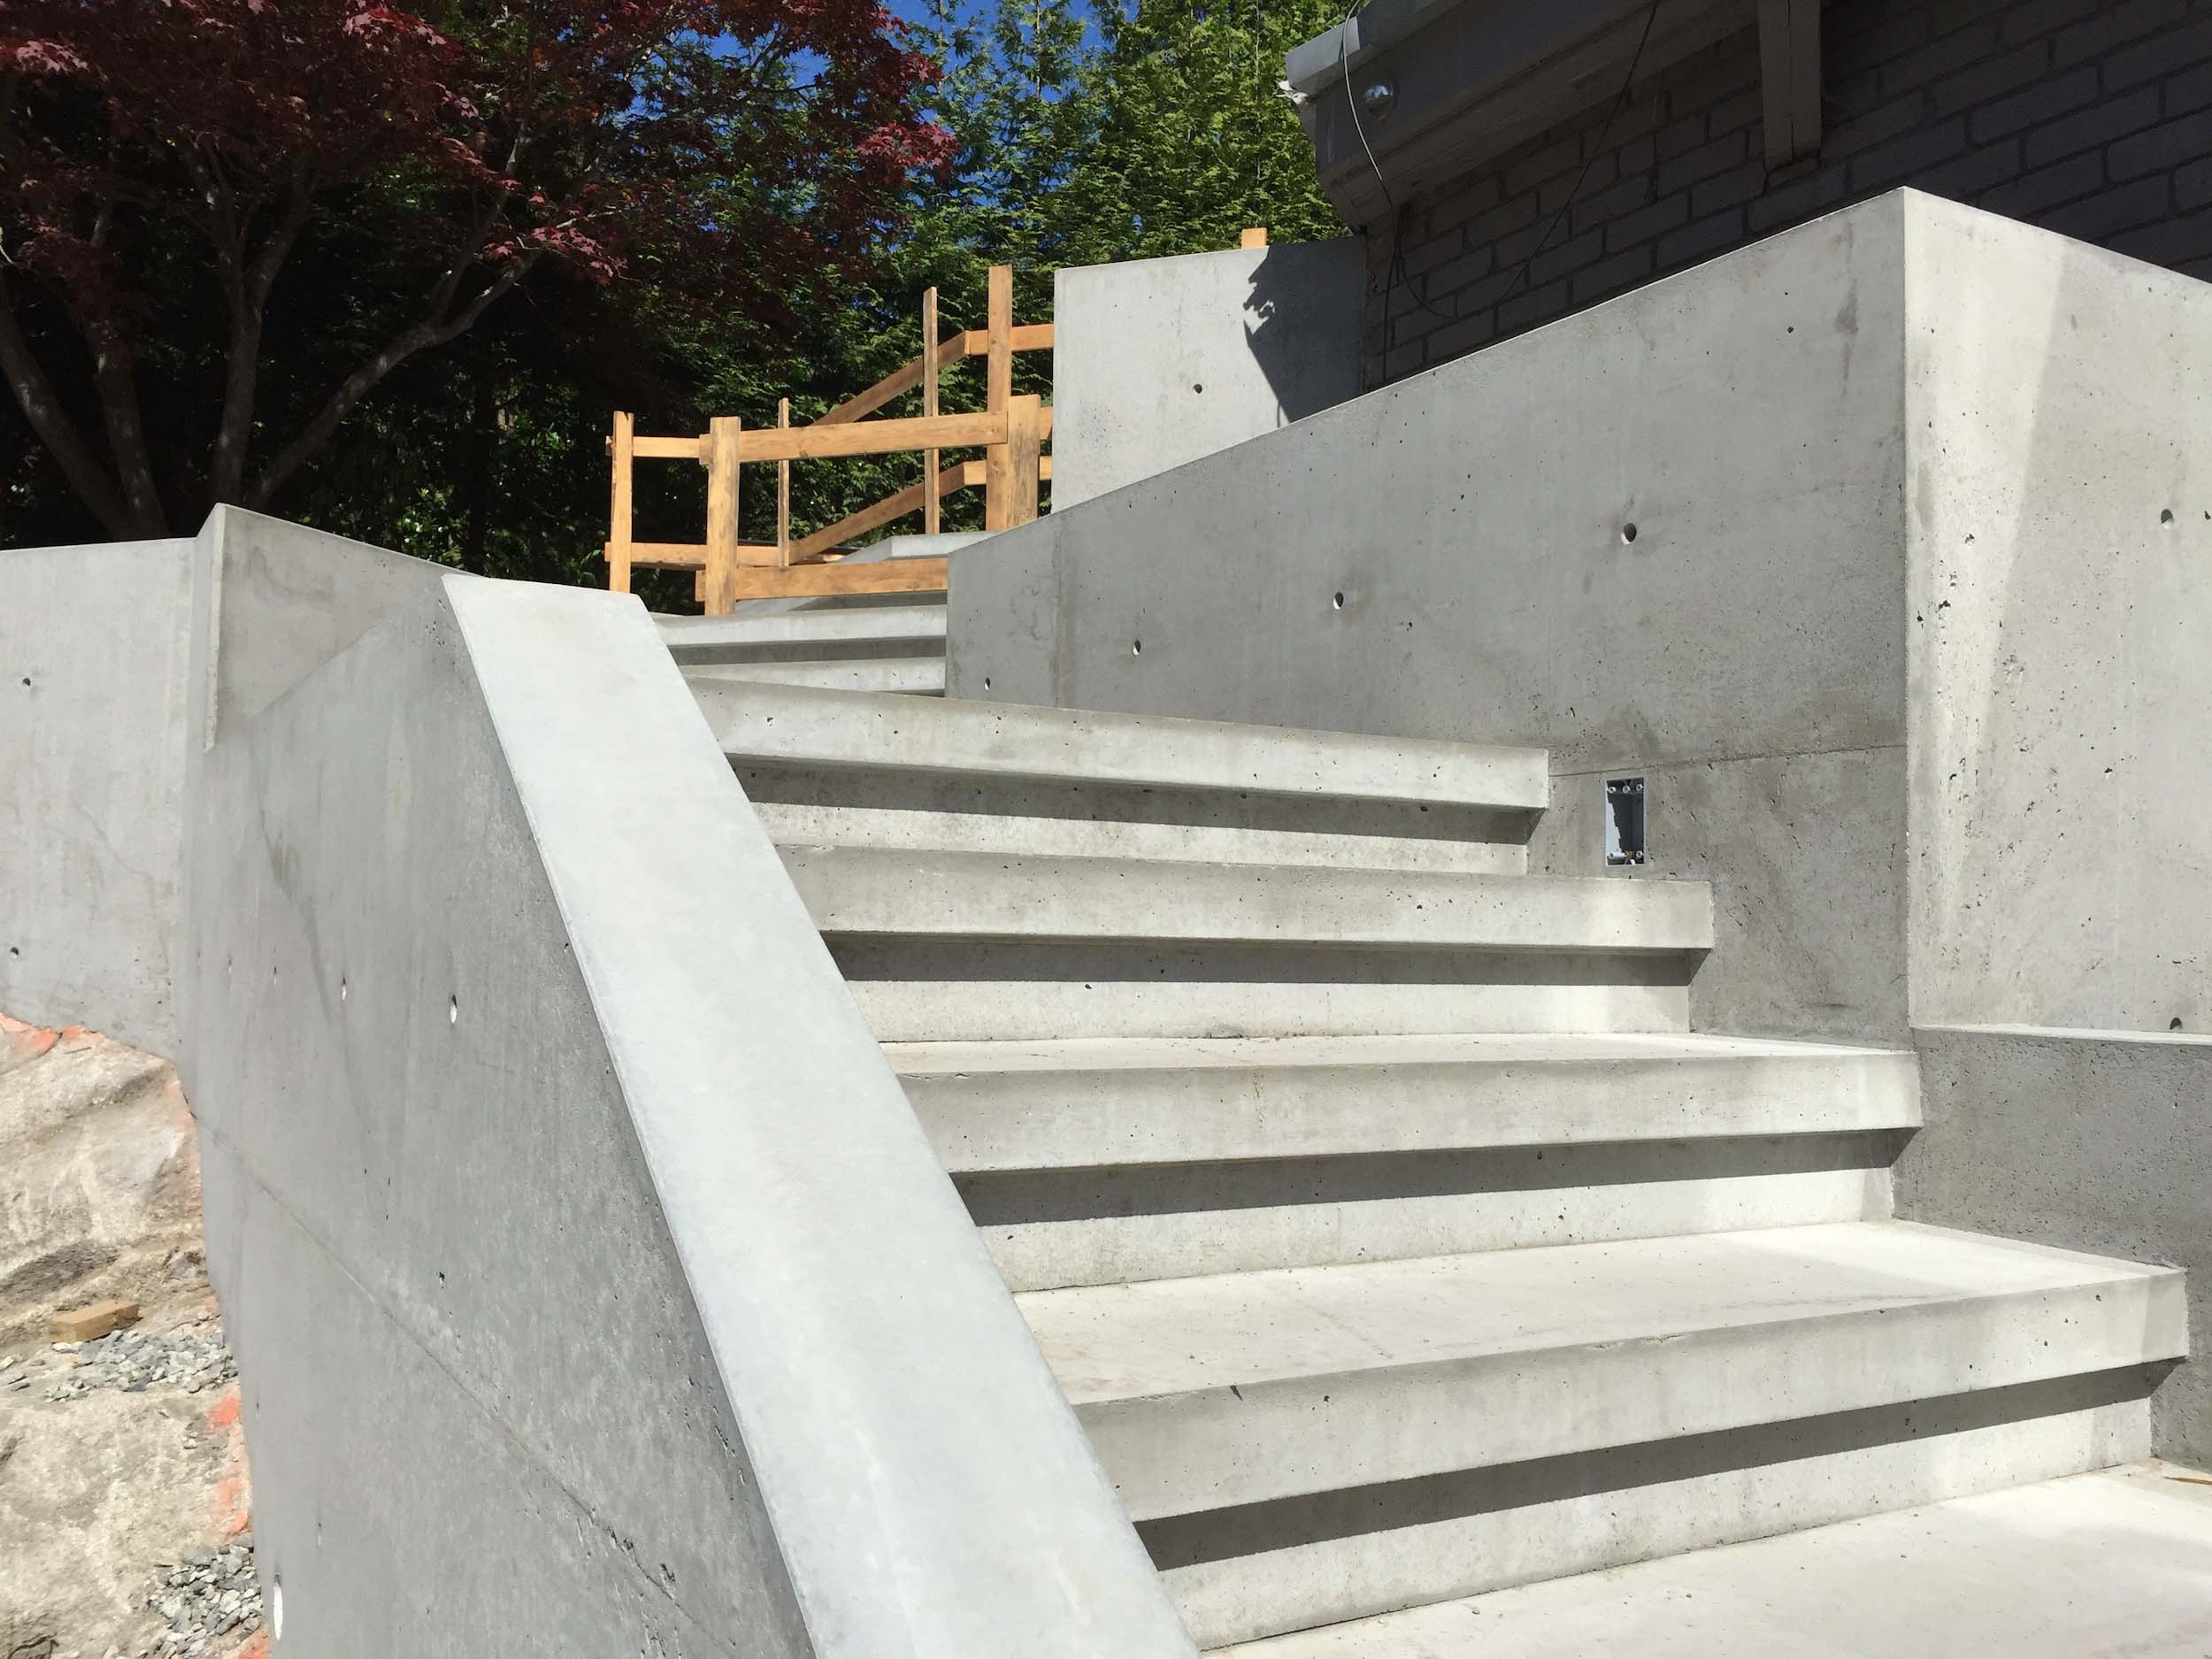 Postle_Construction_ConcreteForming27.jpg